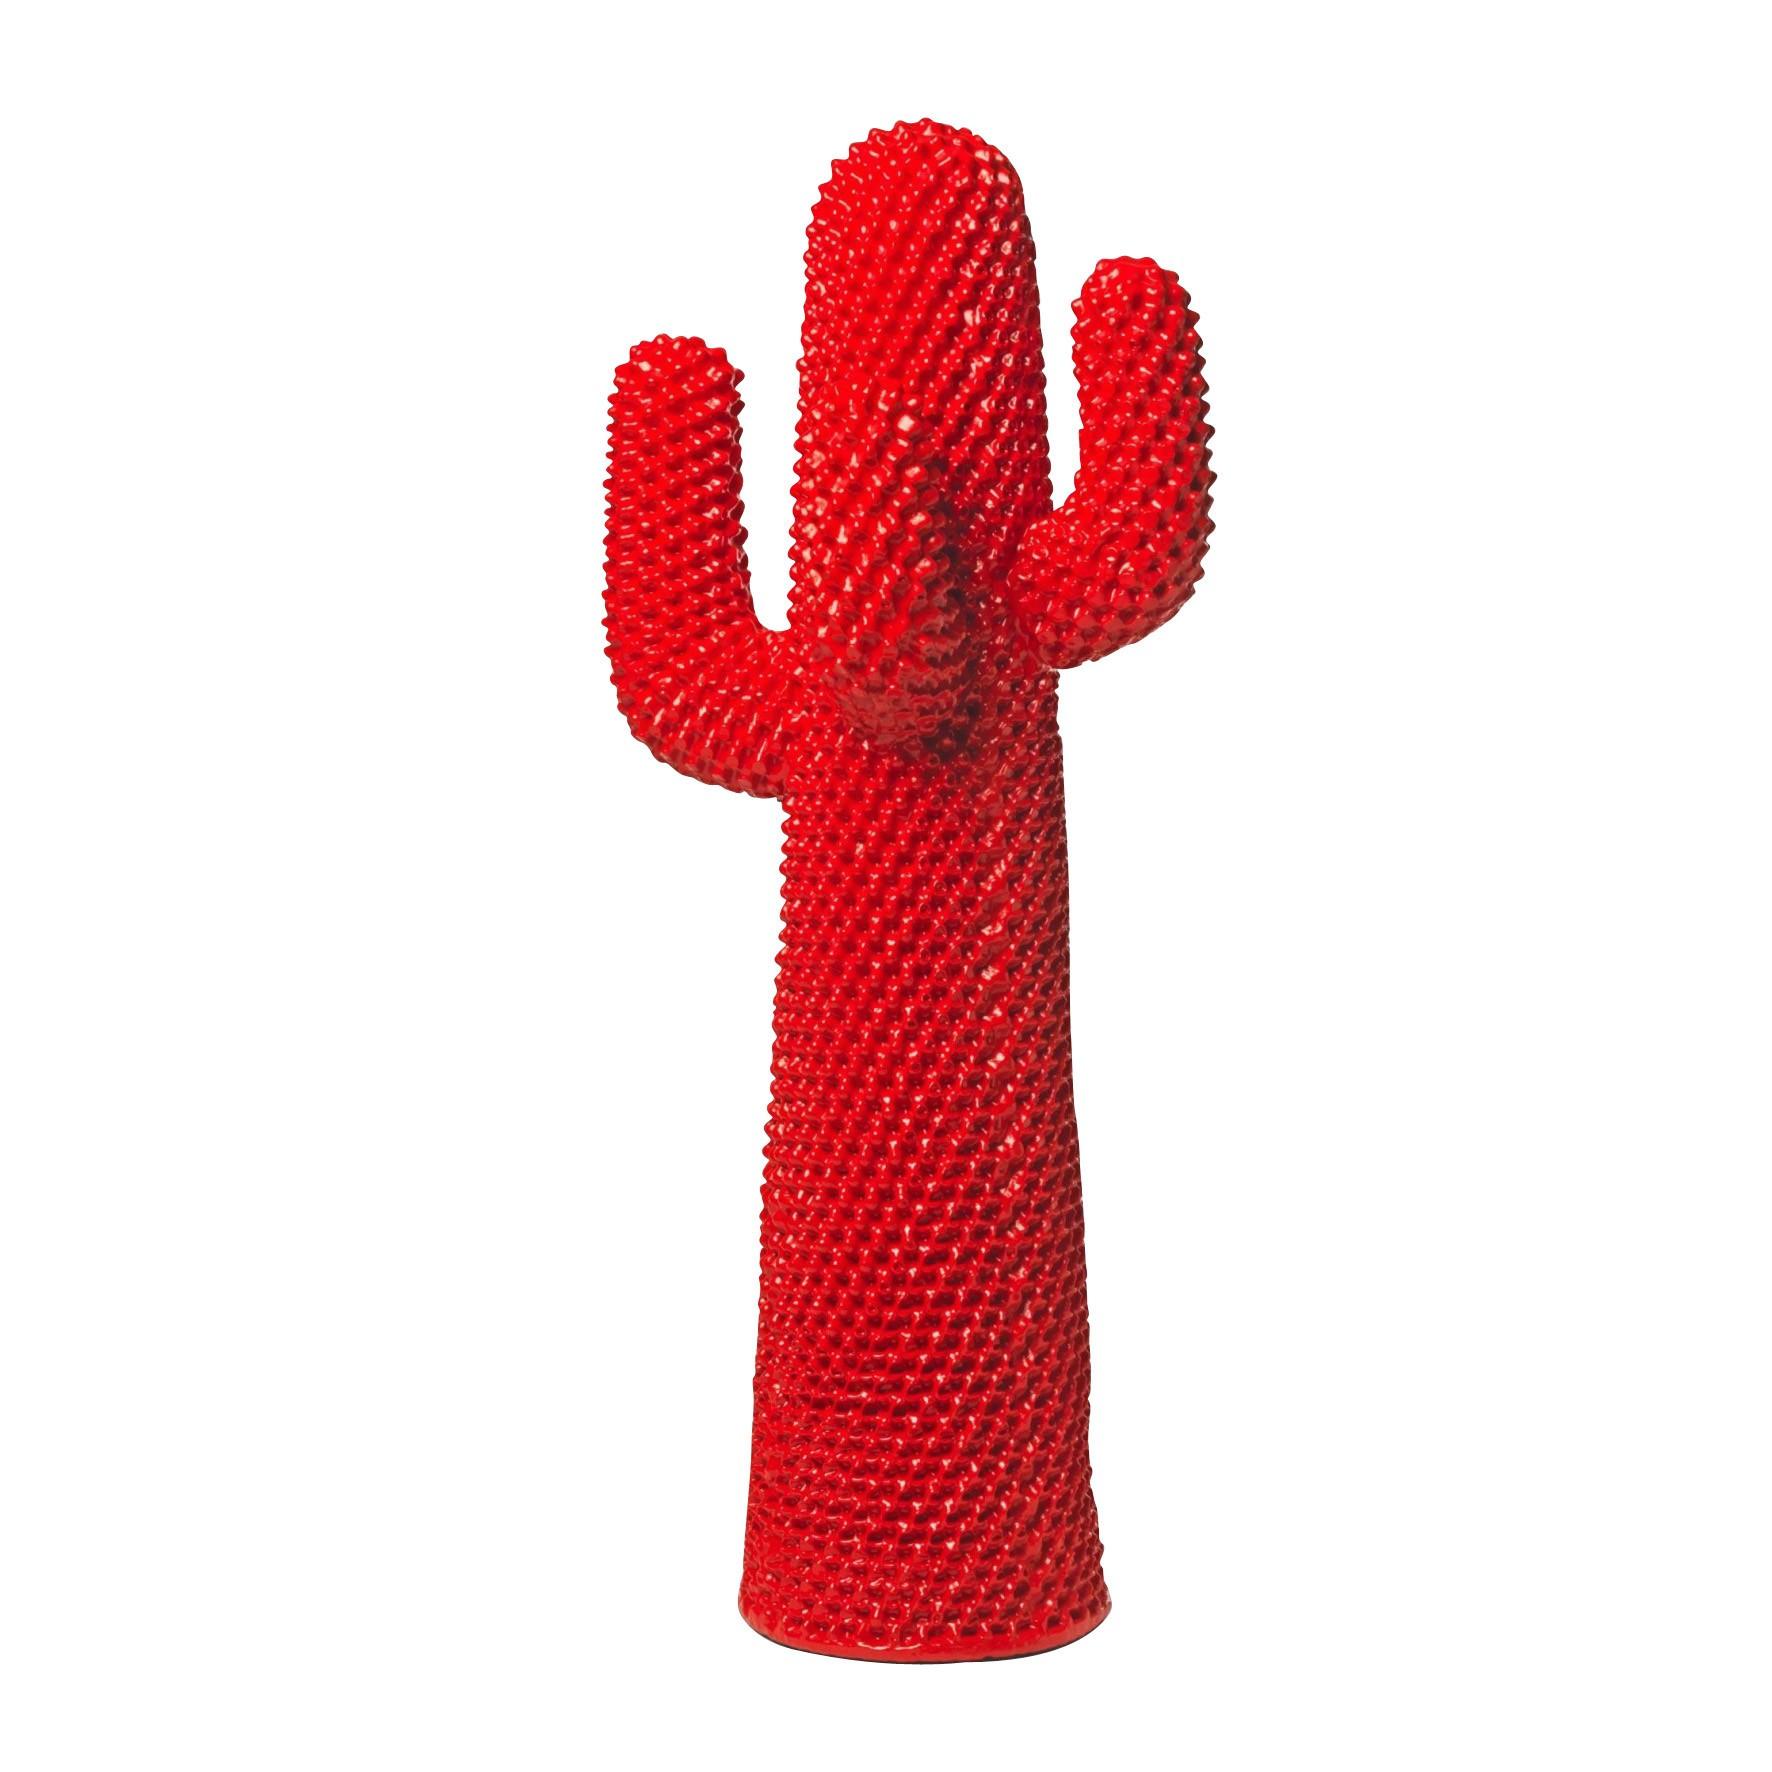 gufram cactus porte manteaux ambientedirect. Black Bedroom Furniture Sets. Home Design Ideas